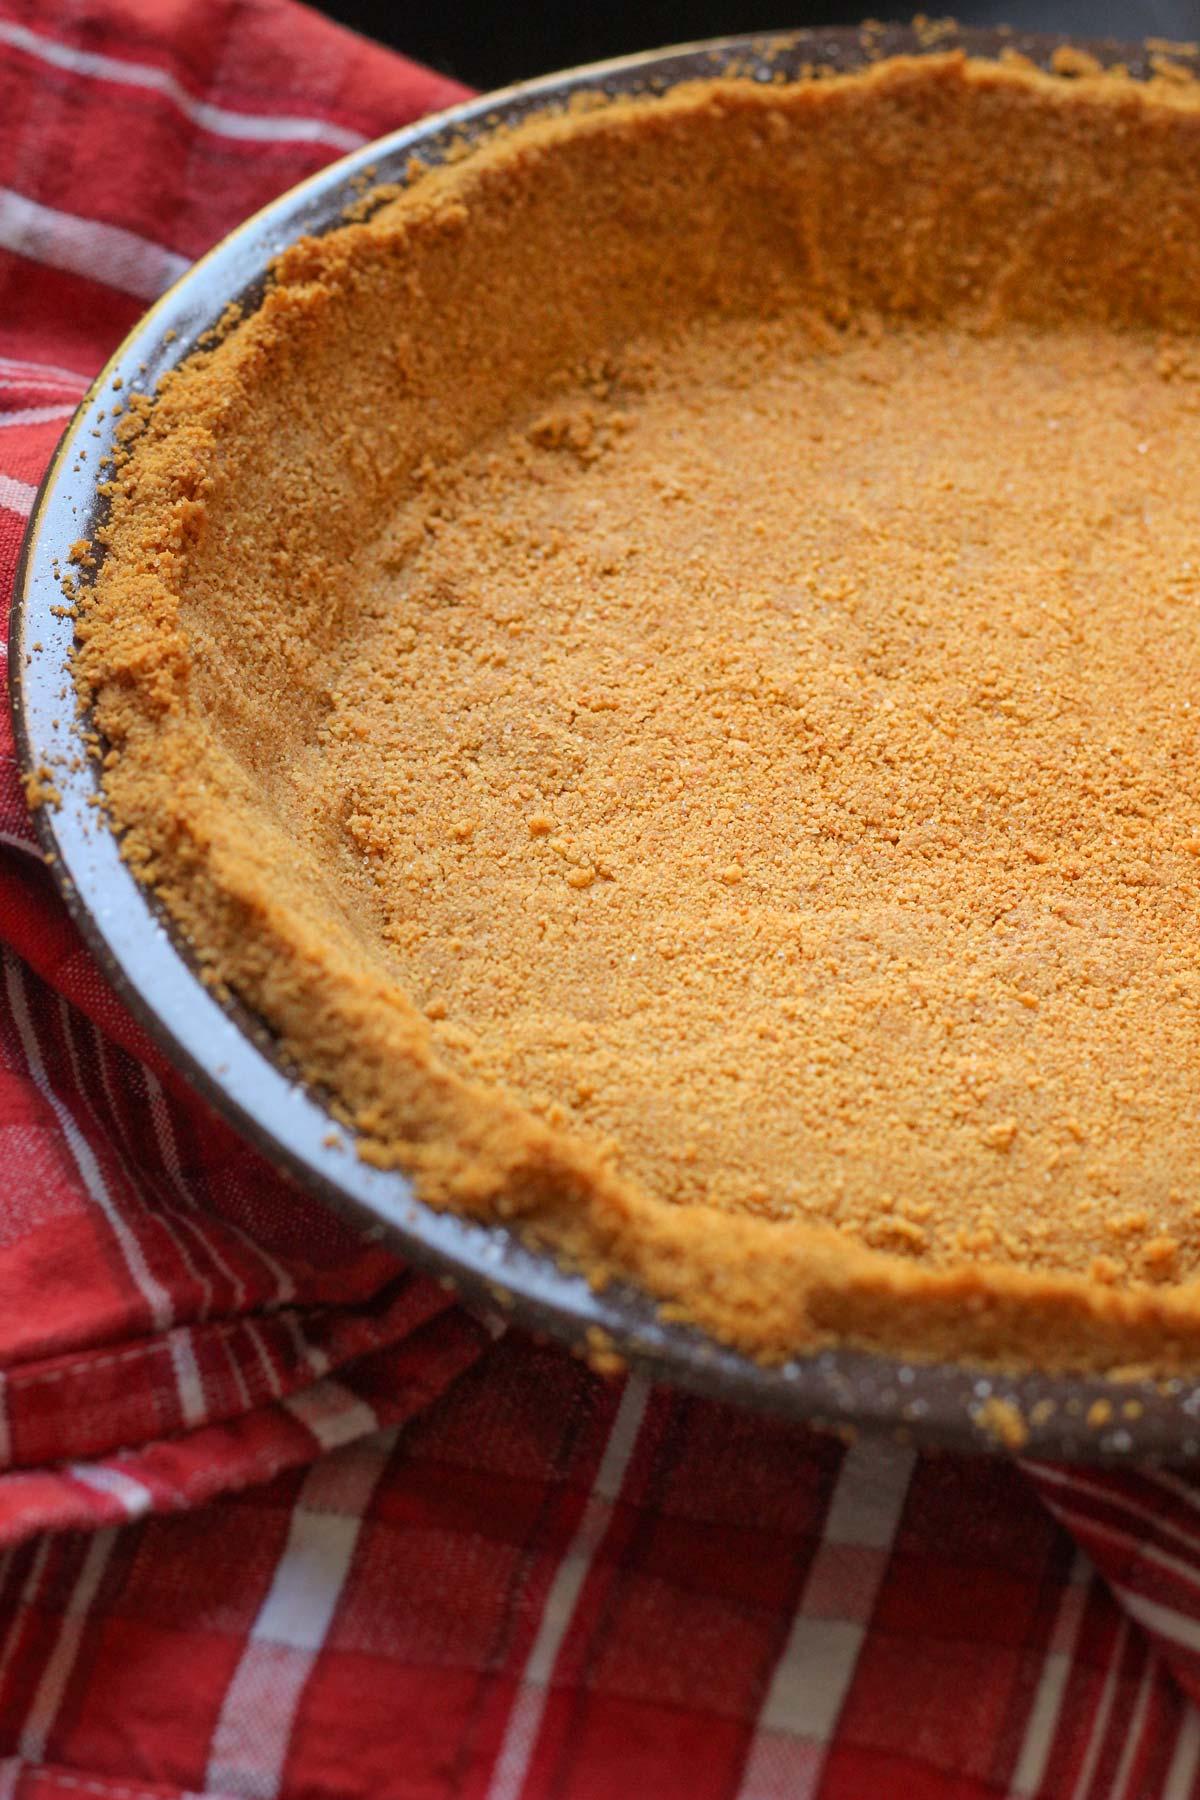 graham cracker crust in brown pie plate on red plaid towel.